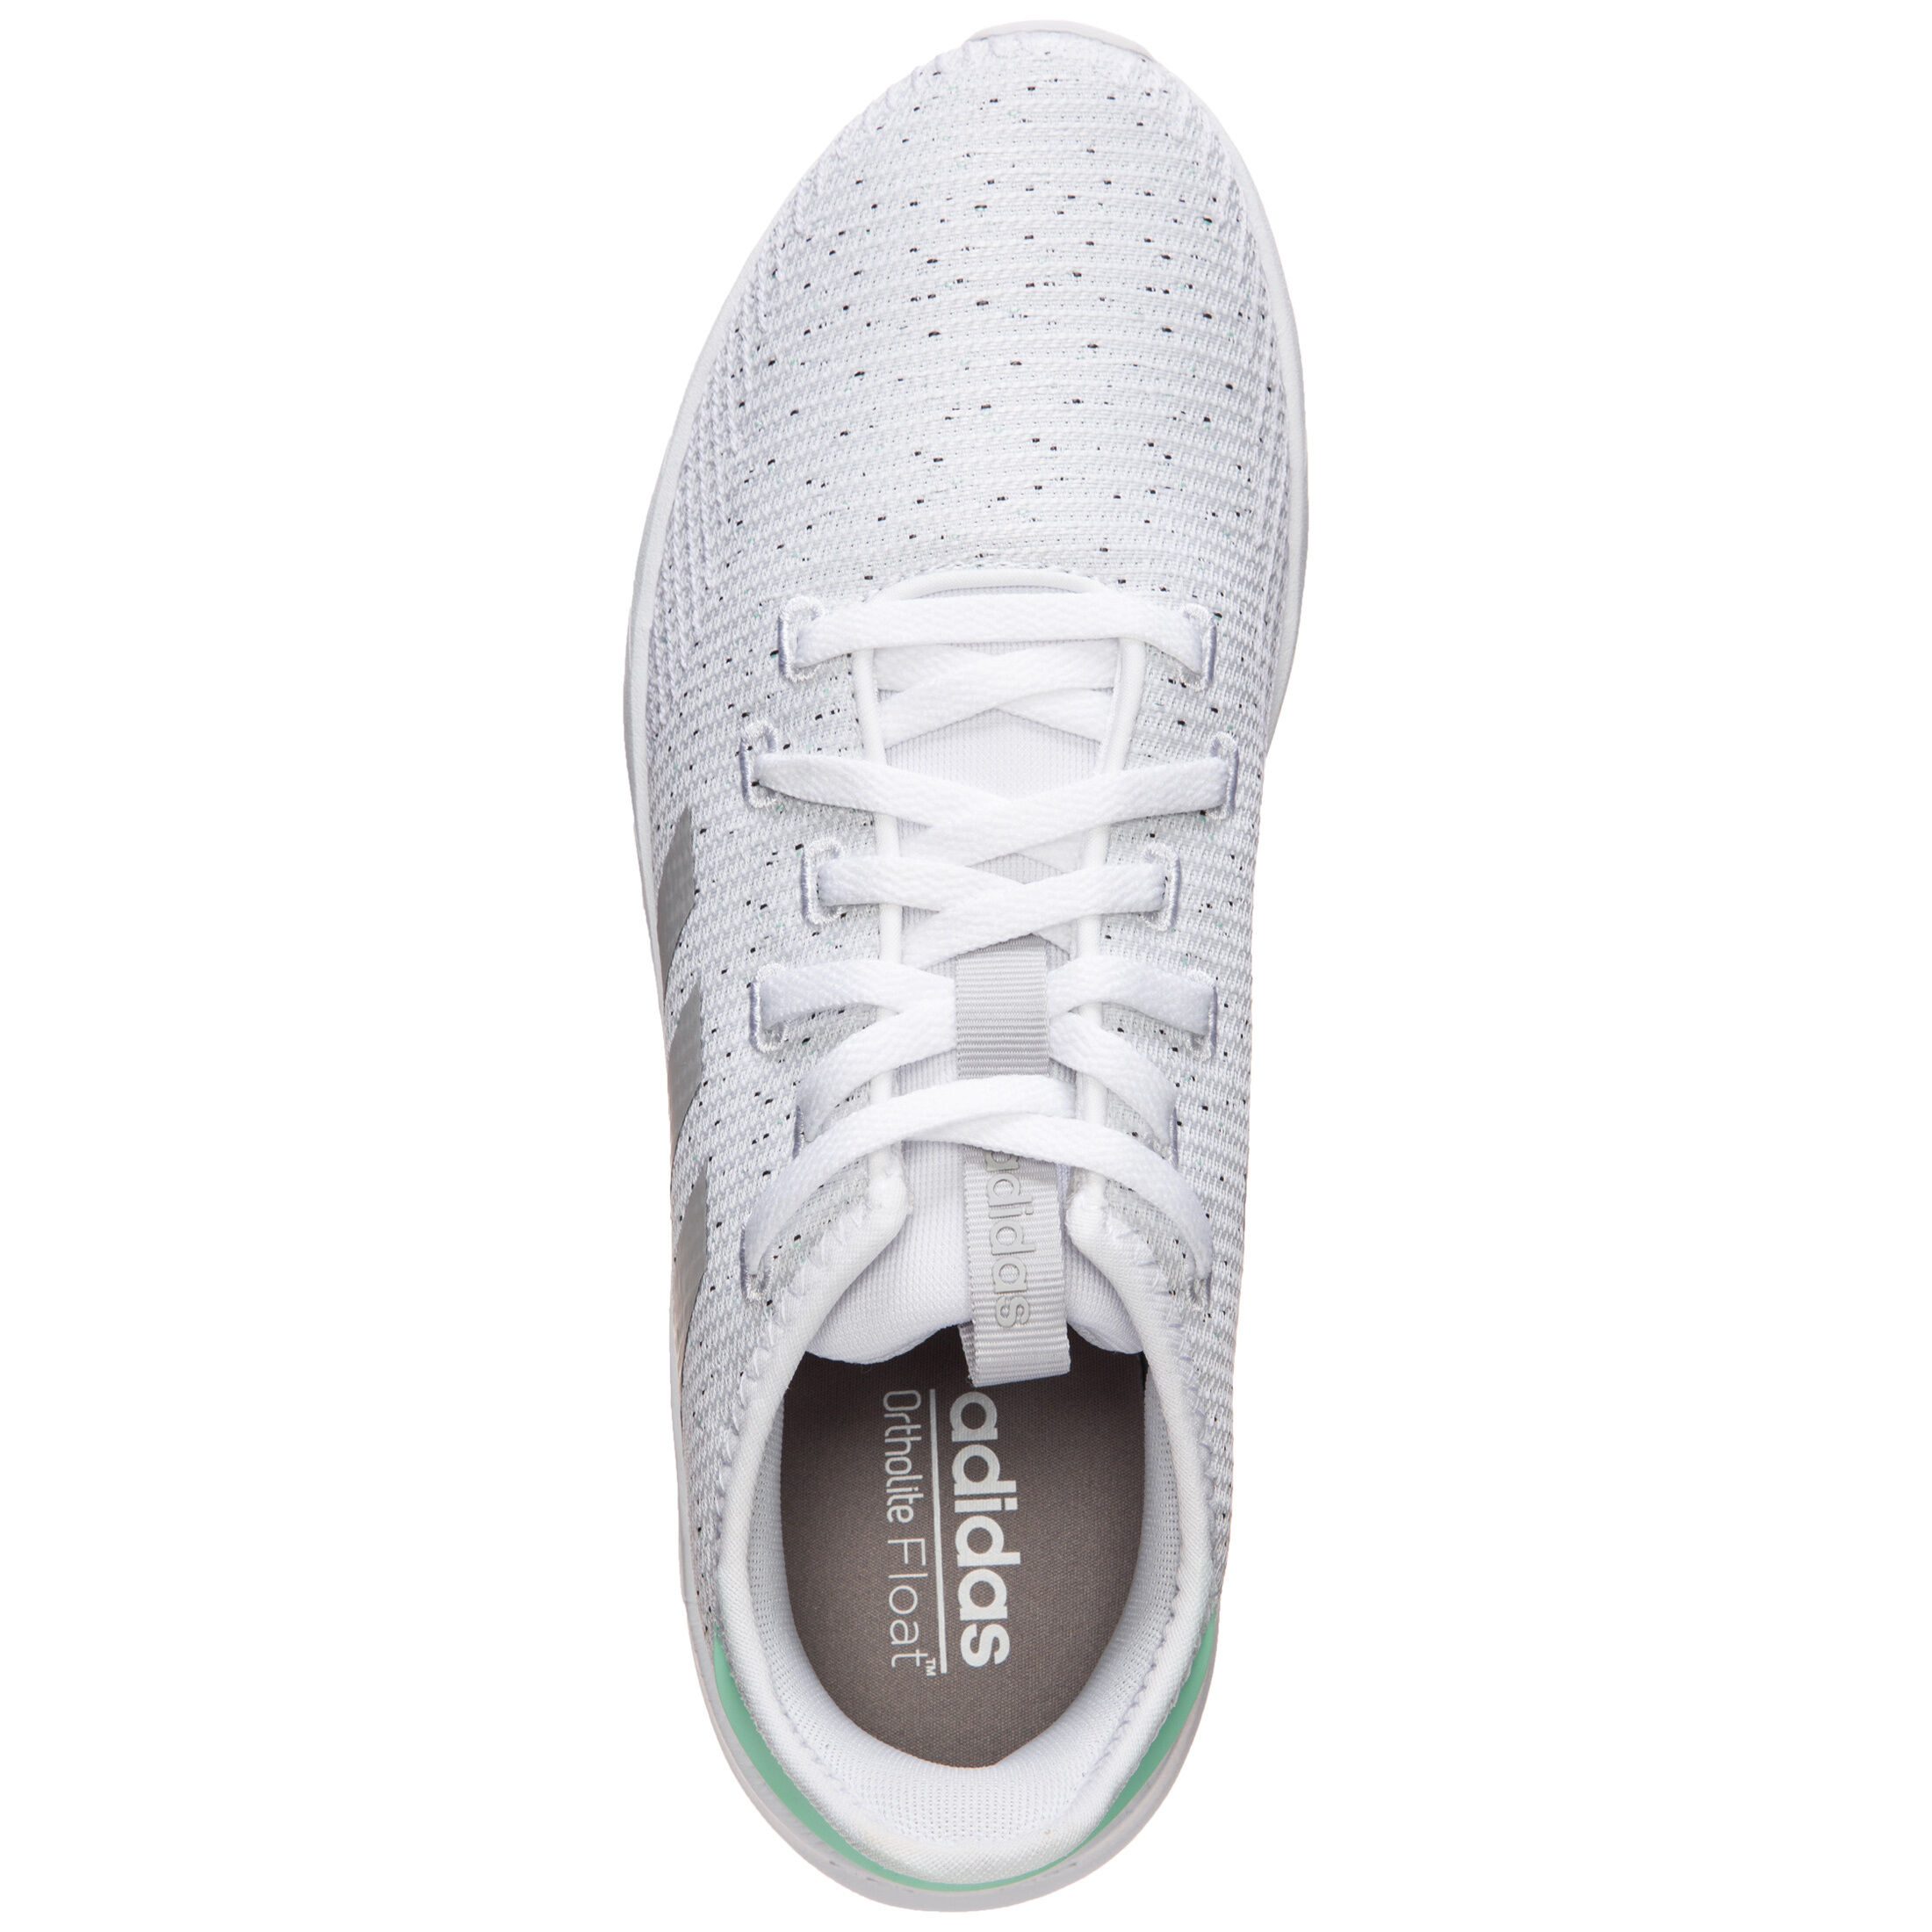 Adidas Damen Sneaker Ortholite Float